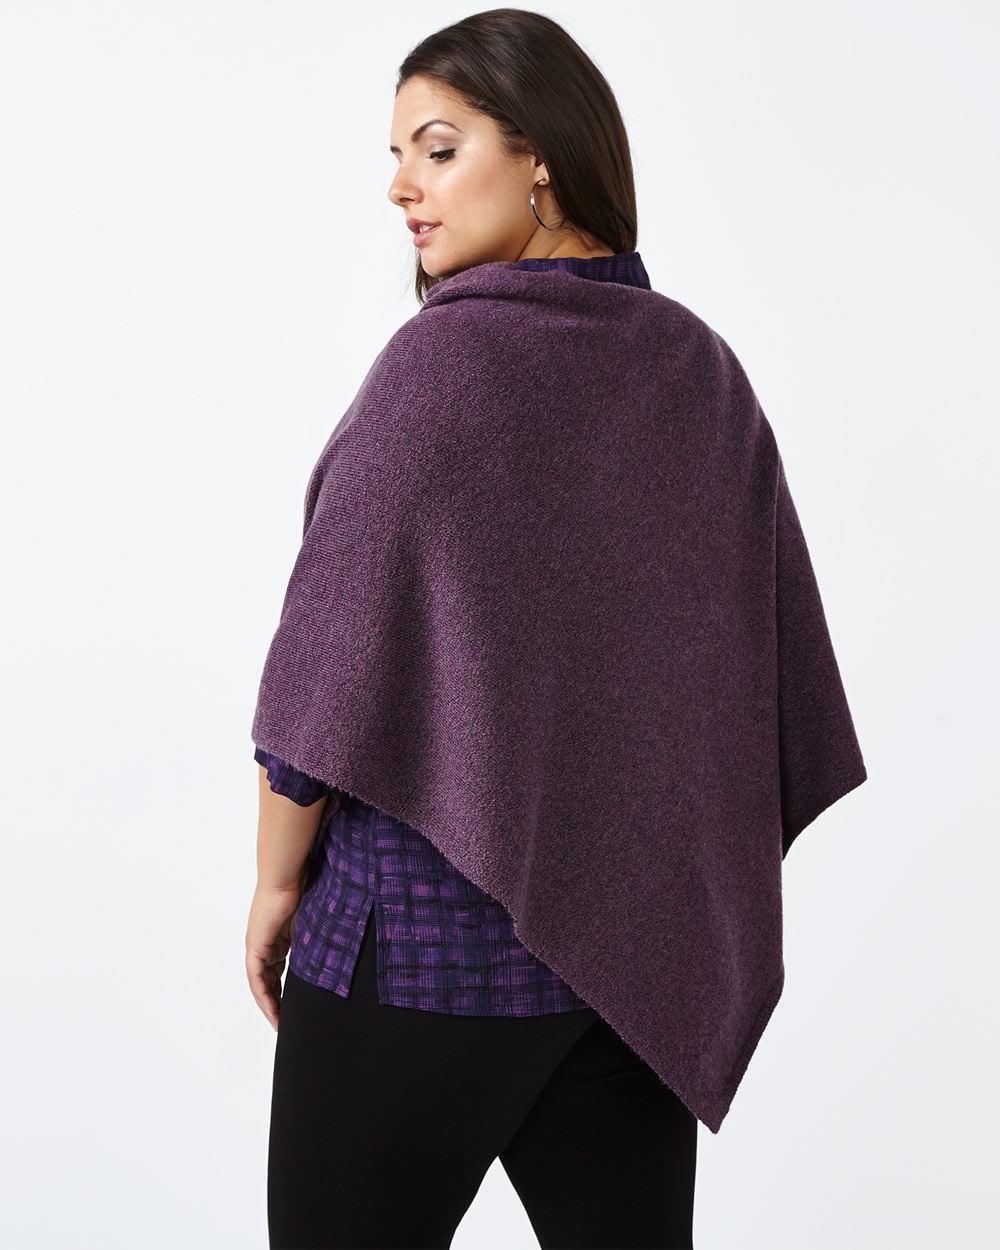 Knit Sweater Poncho